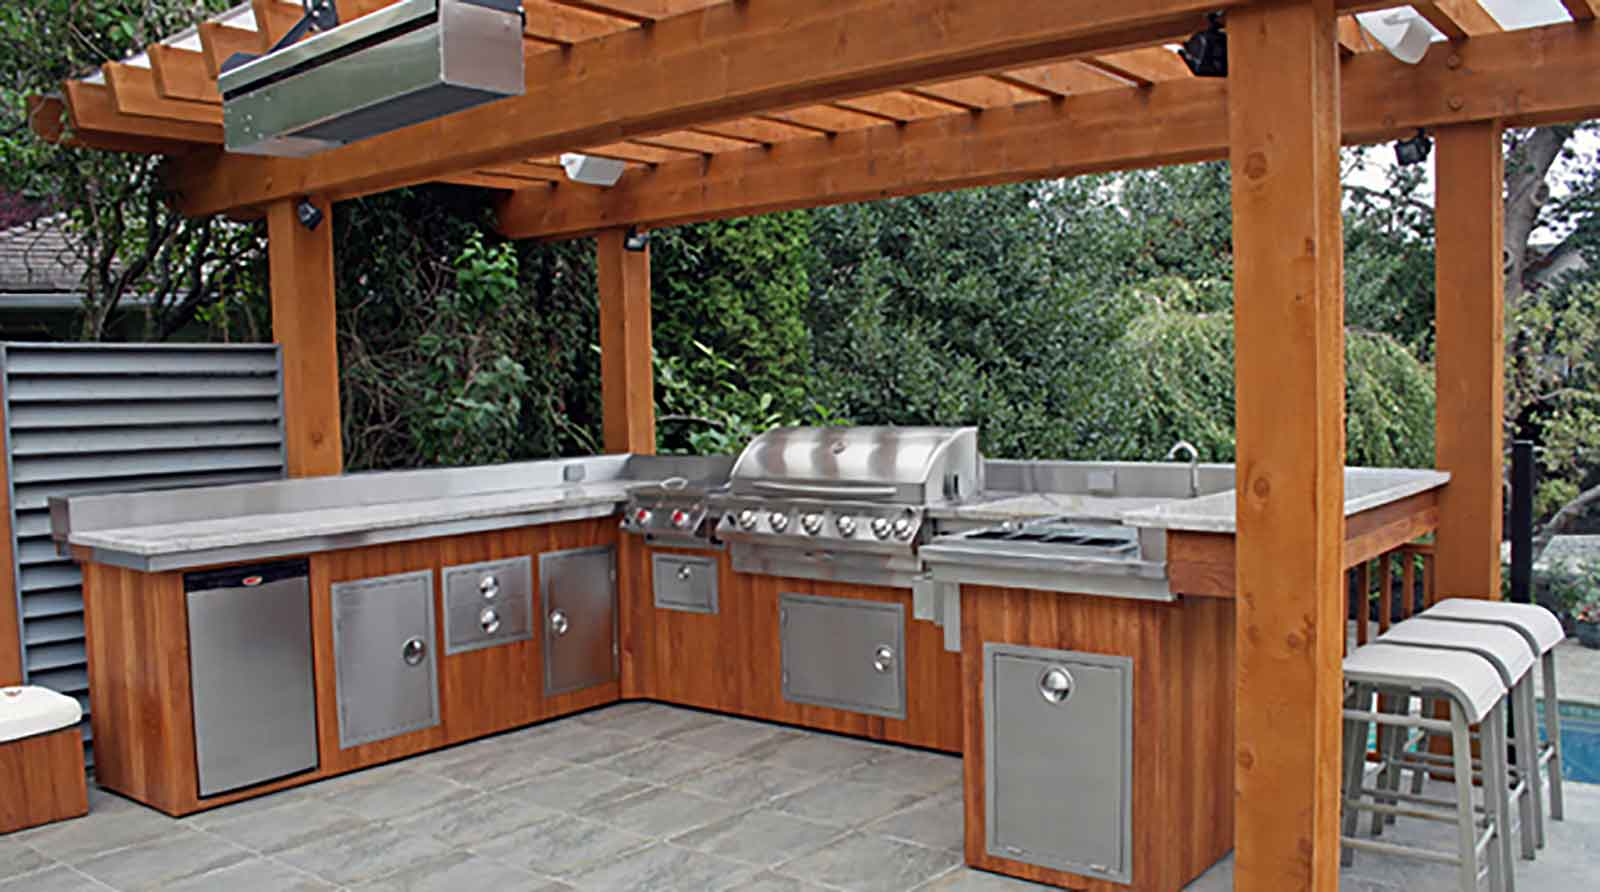 outdoor kitchen design plans free modern cabinet knobs custom designed kitchens azuro concepts